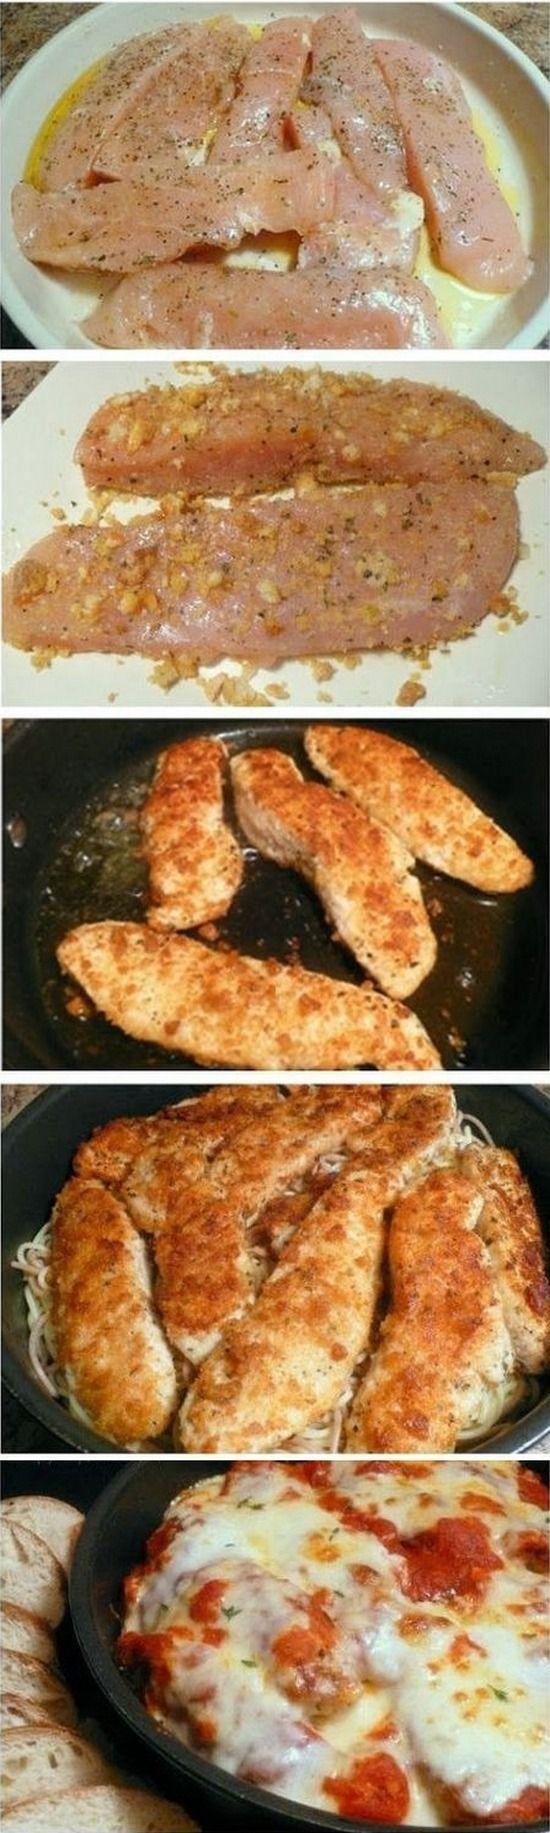 Skillet Chicken Parmesan Over Pasta | Gurman chef